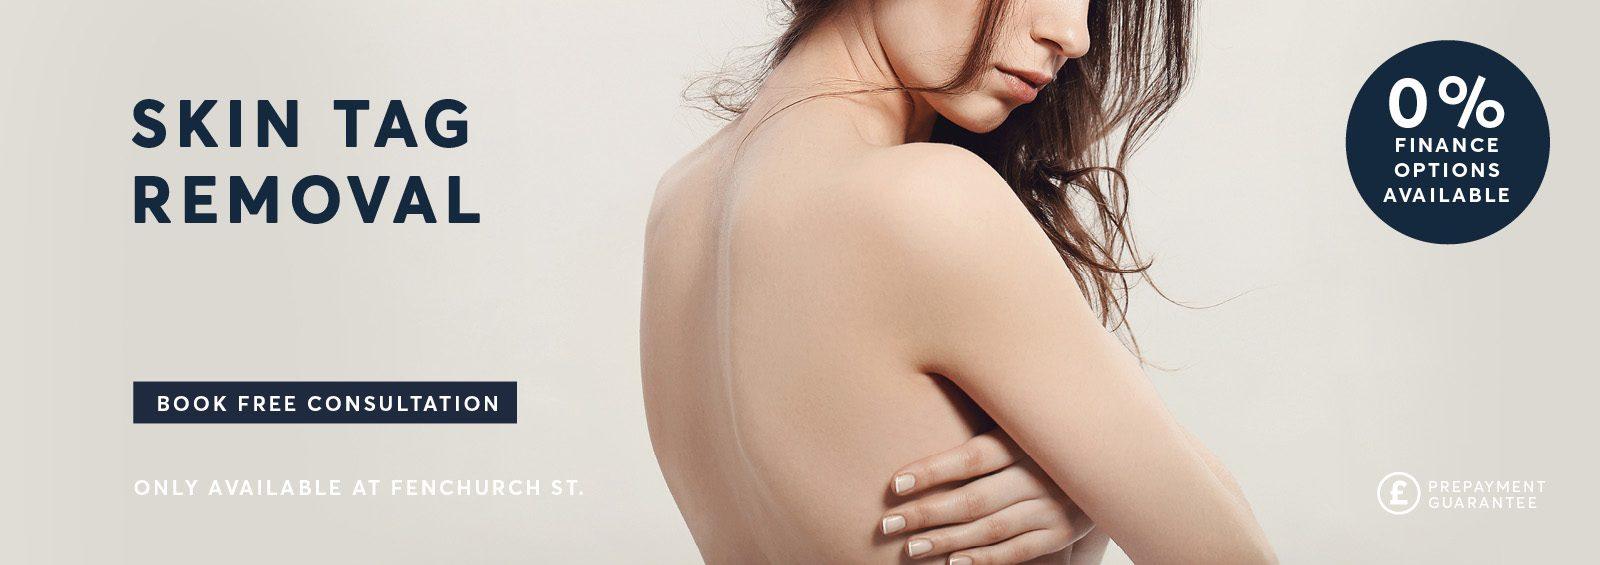 Skin Tag removal London